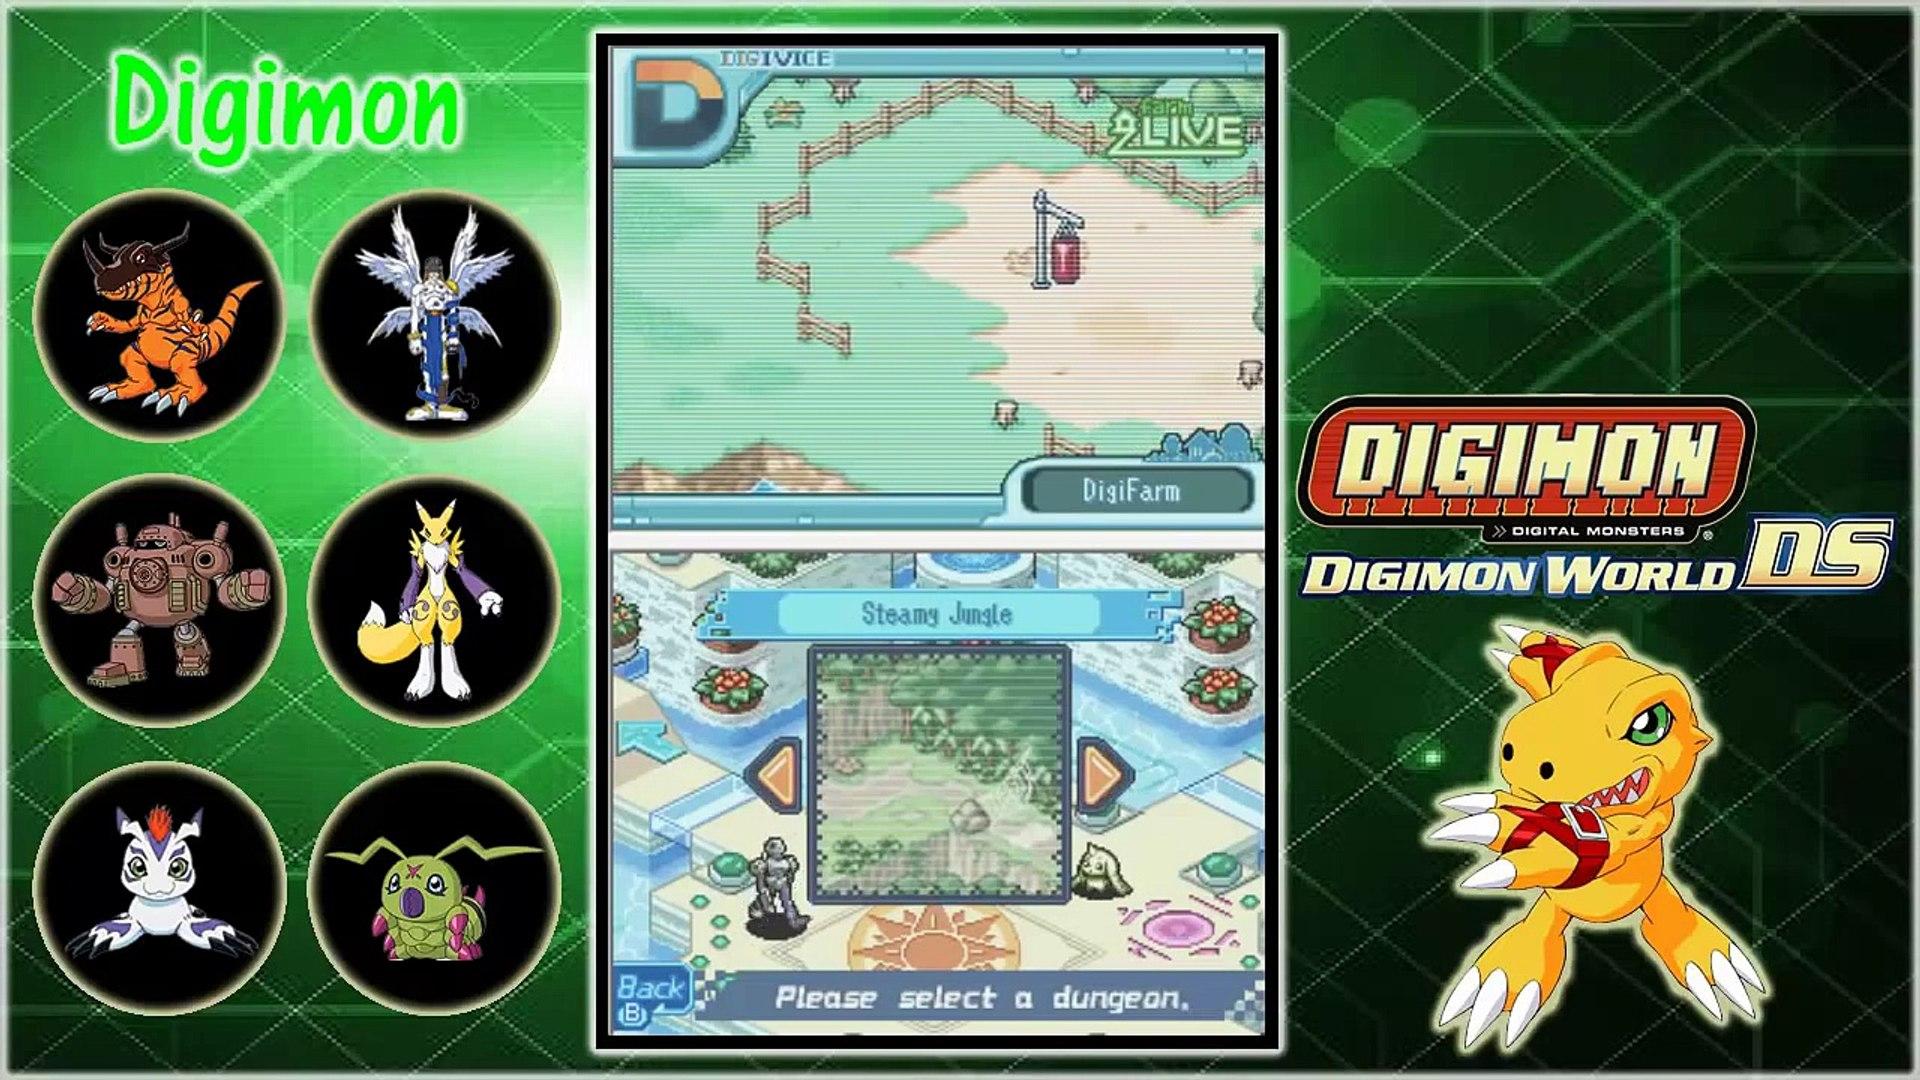 Digimon World Dawn Maps on digimon world dawn action replay codes, digimon world dawn artwork, digimon world dawn review, digimon world dawn sprites, digimon world dawn guide,